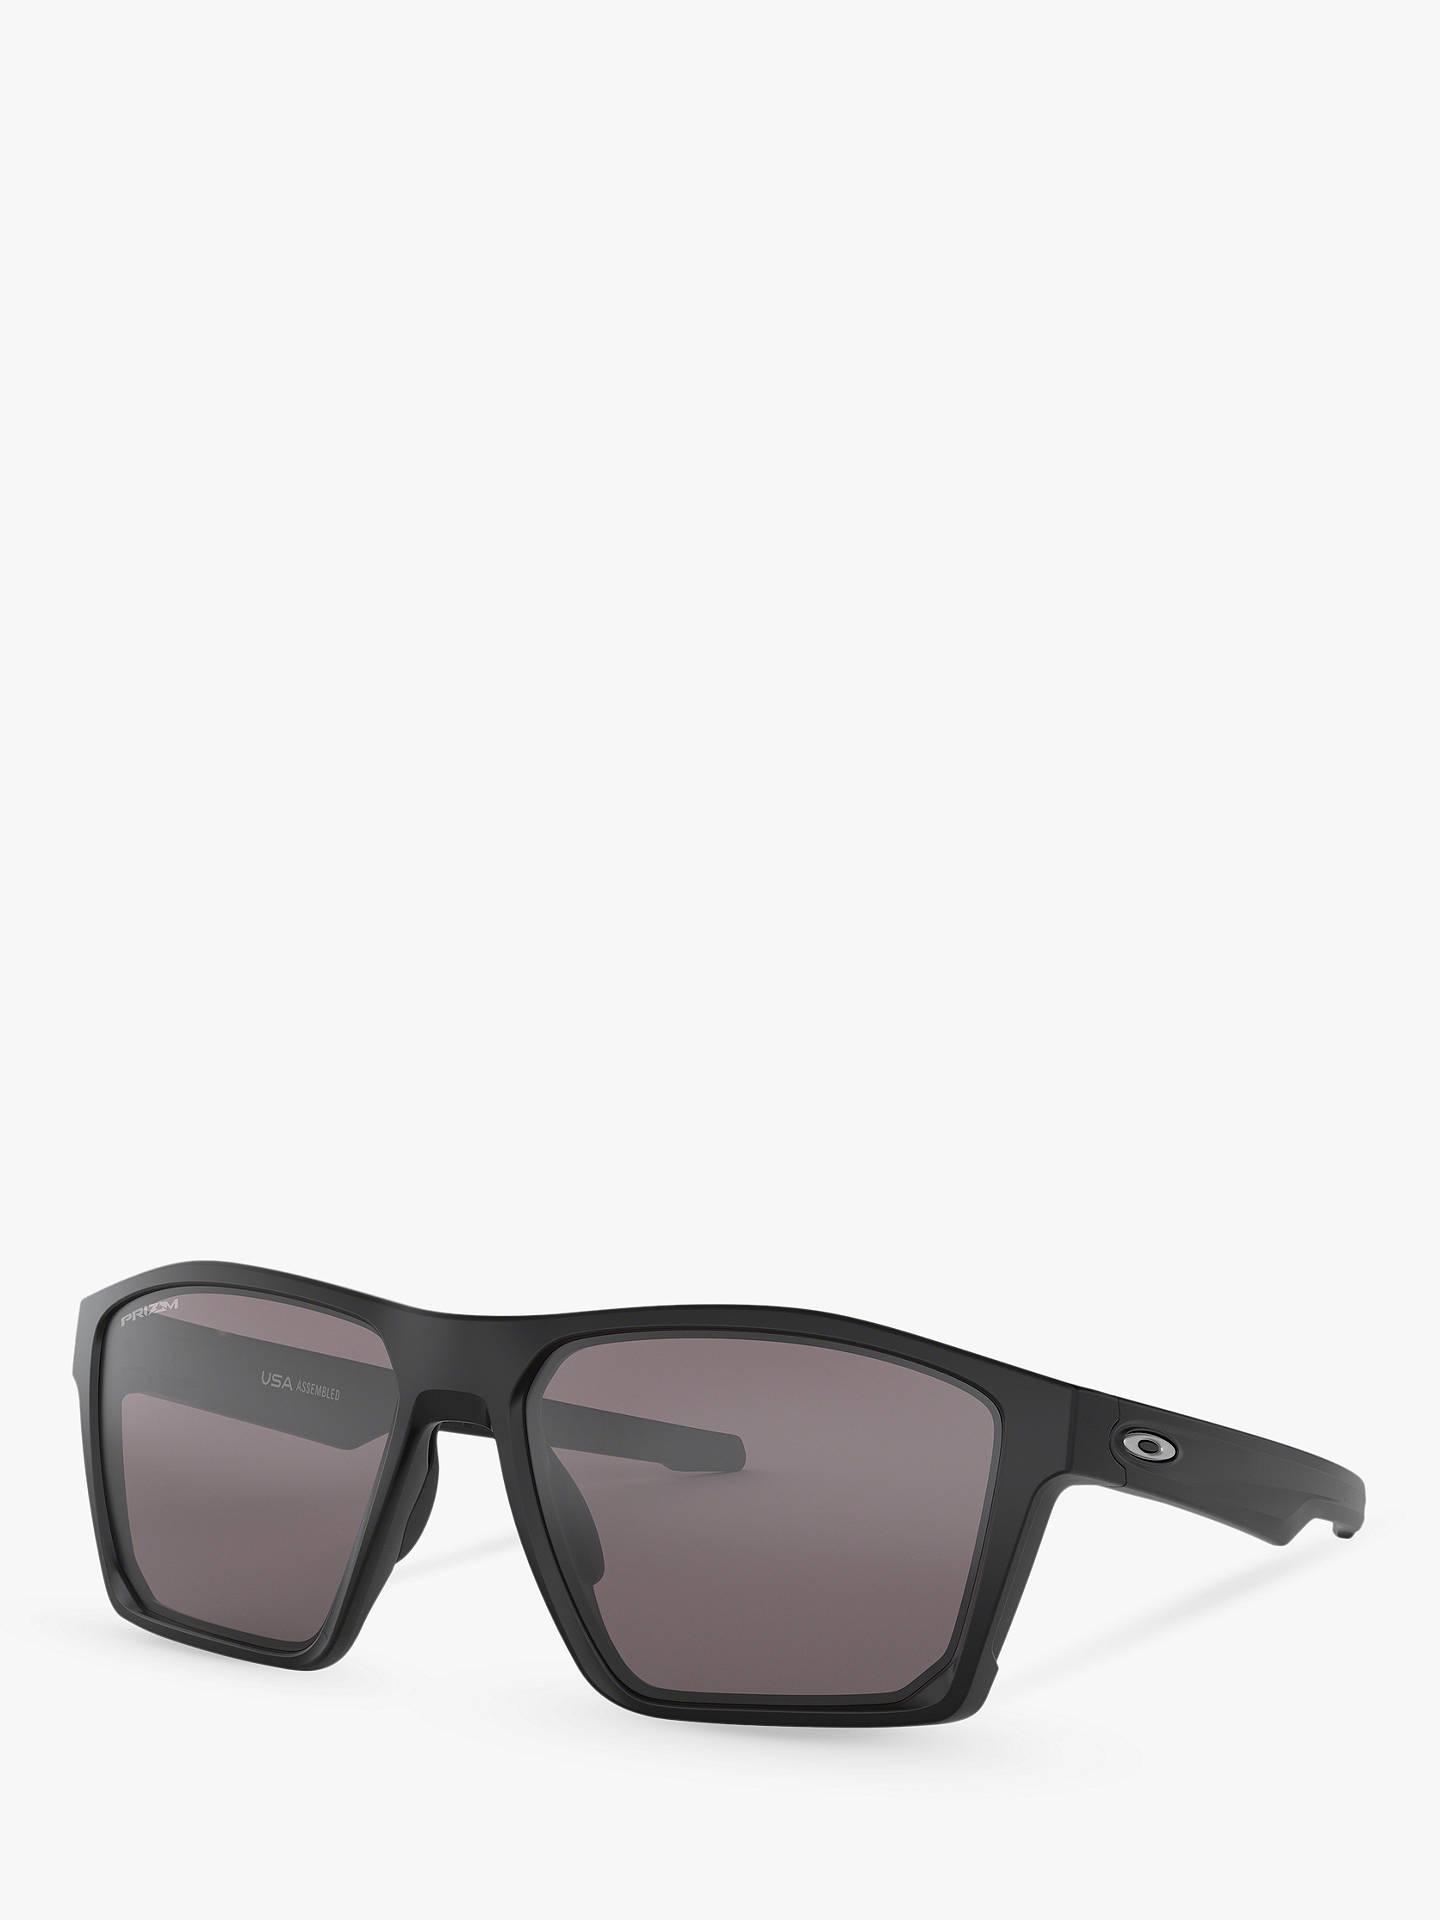 5083df9c31 Oakley OO9397 Men s Targetline Prizm Square Sunglasses at John Lewis ...